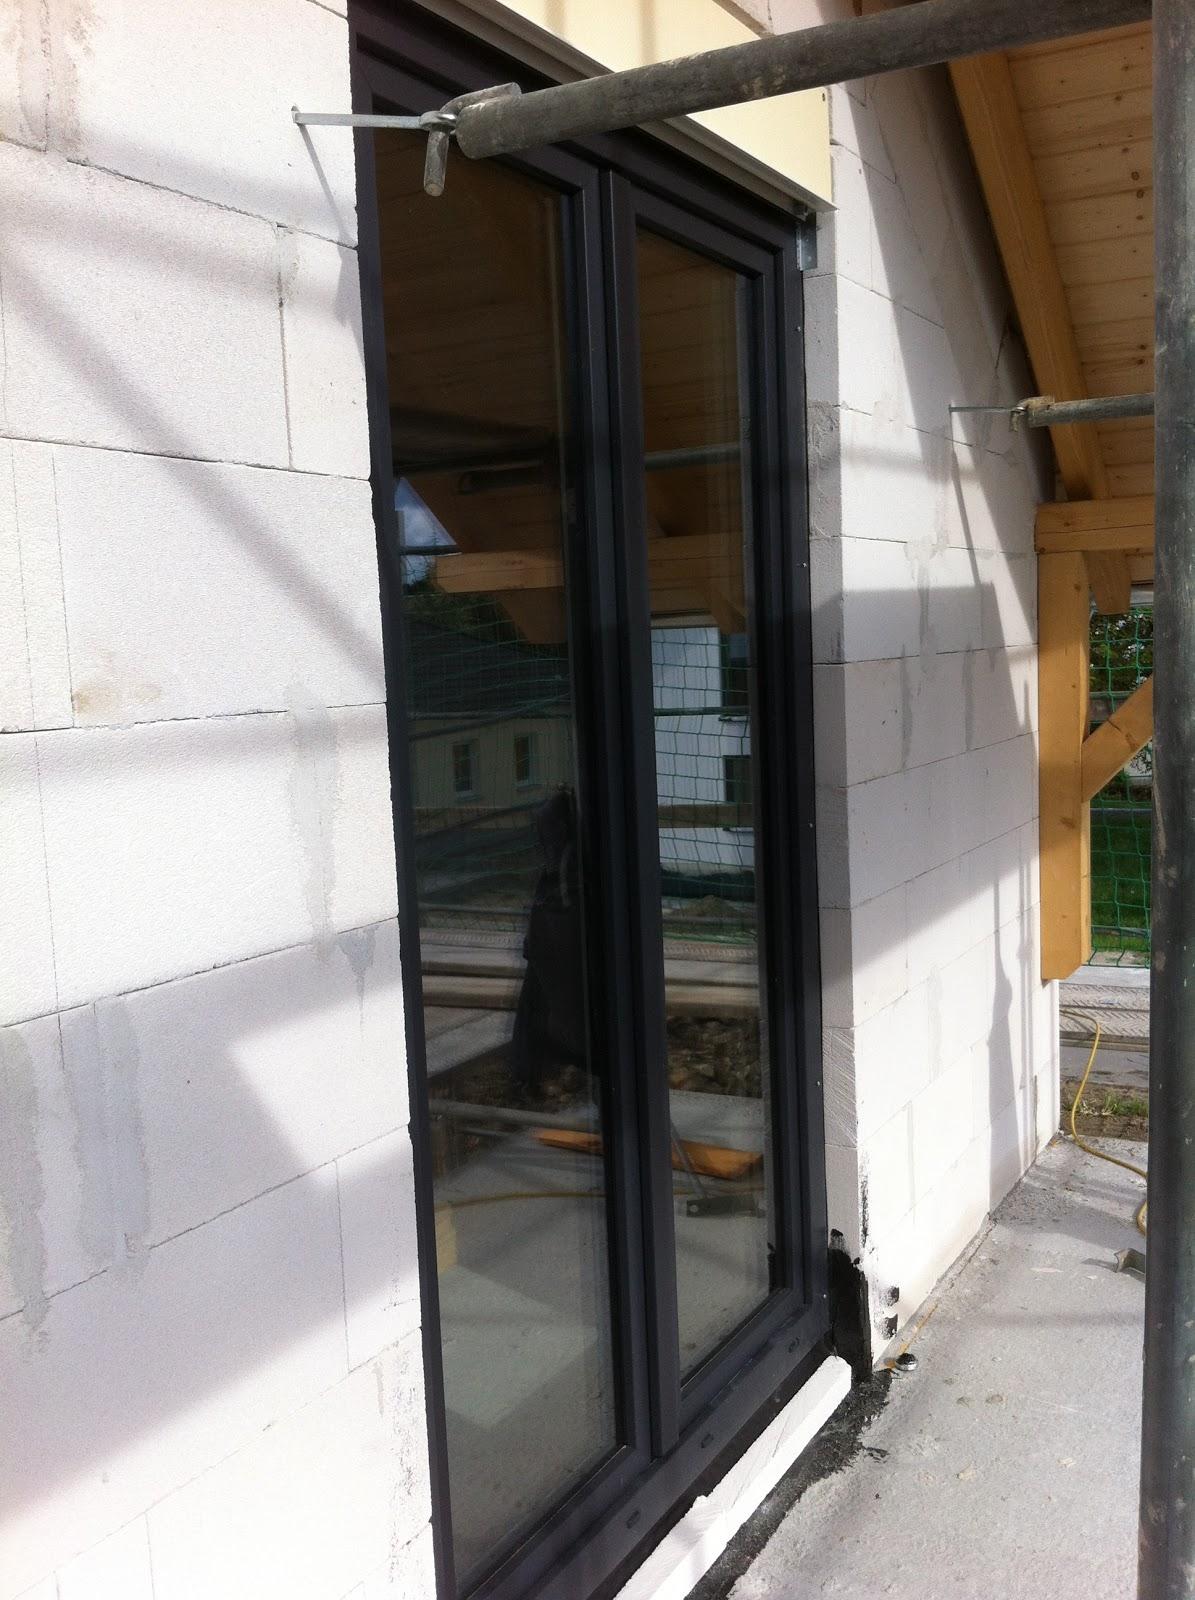 Extrem Rollos Mit Saugnapf. Interesting Fenster Auen Saugnapf With Rollos BD83